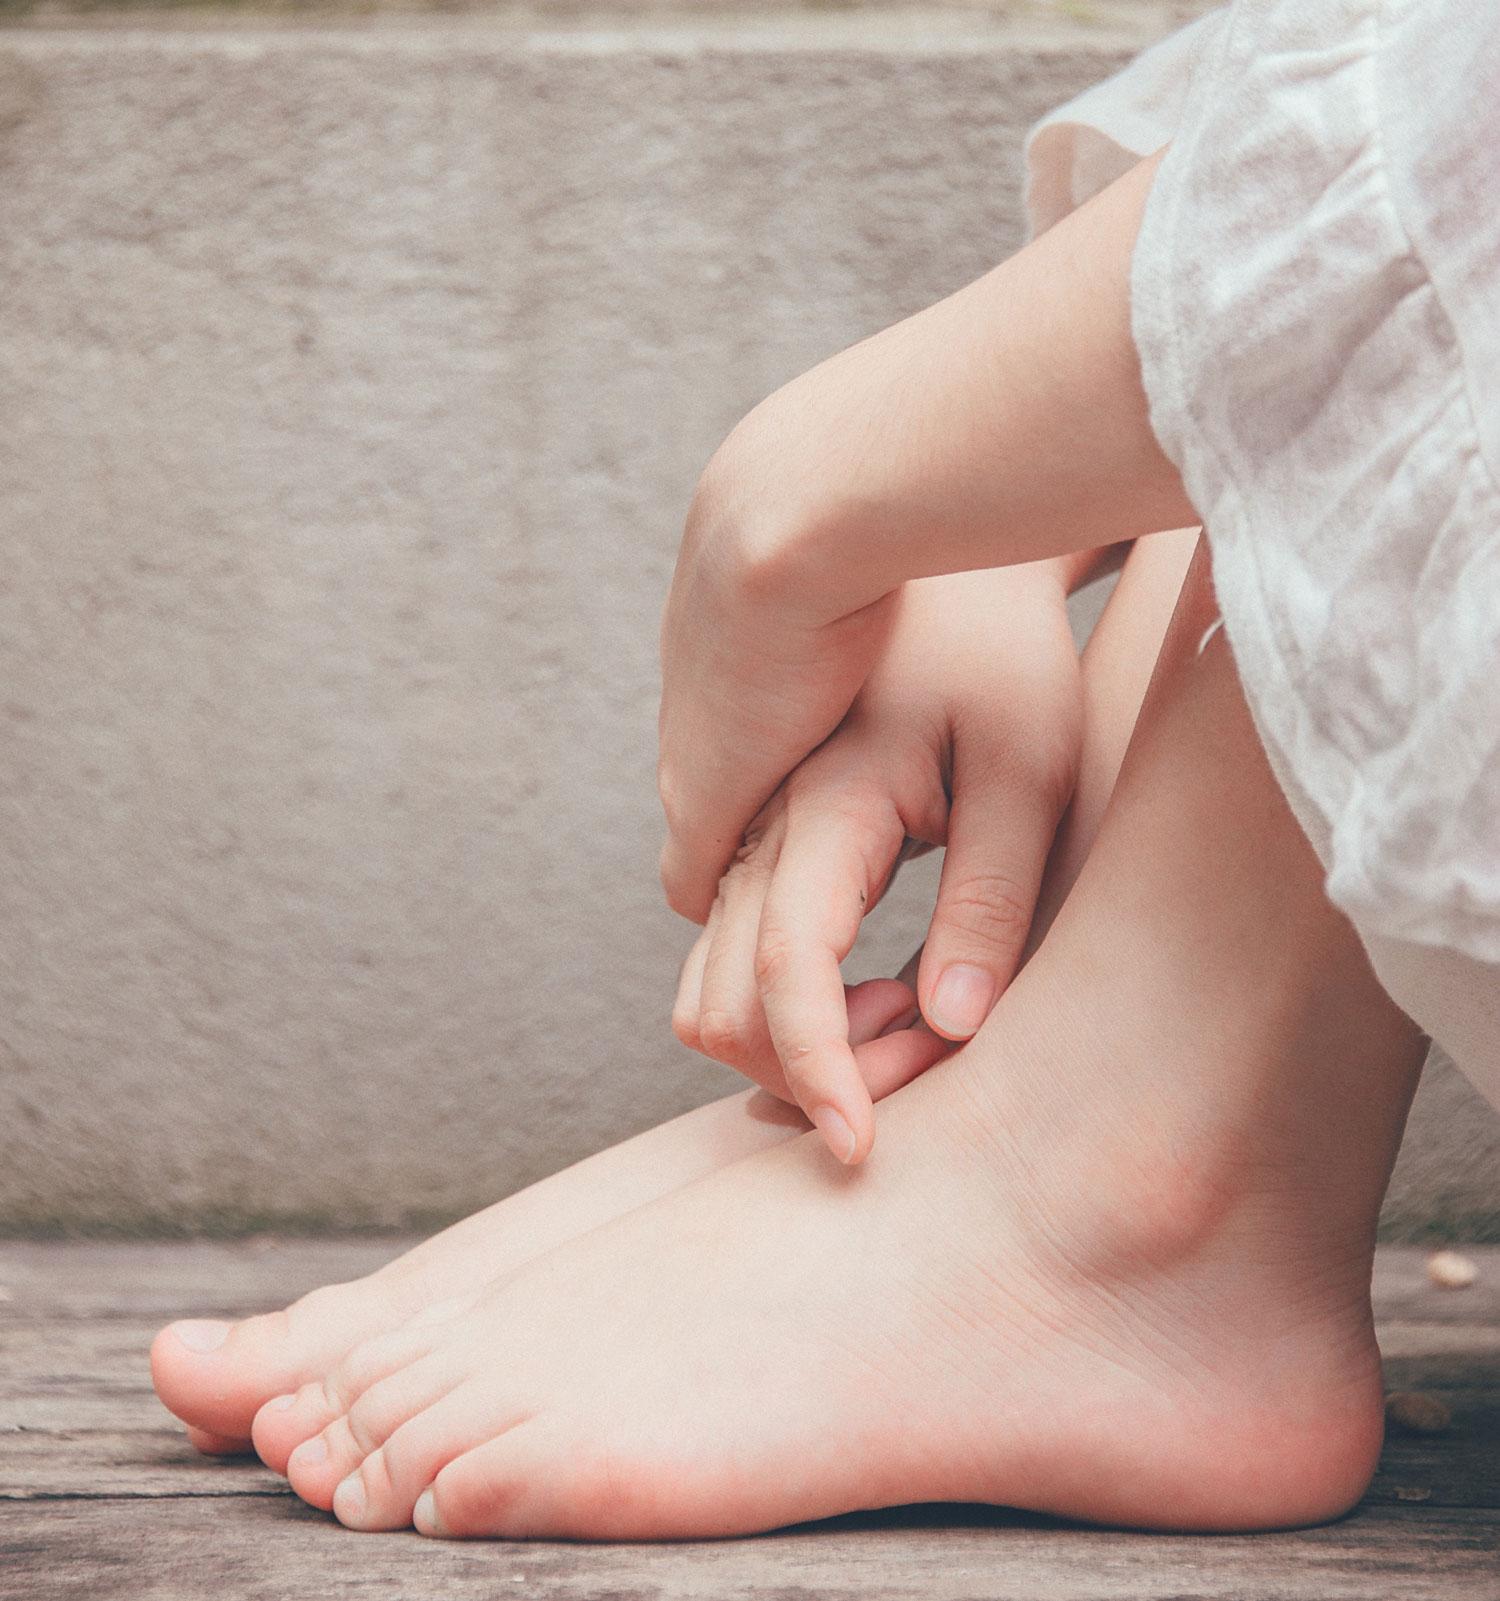 barefoot-close-up-feet-1076584_sized.jpg